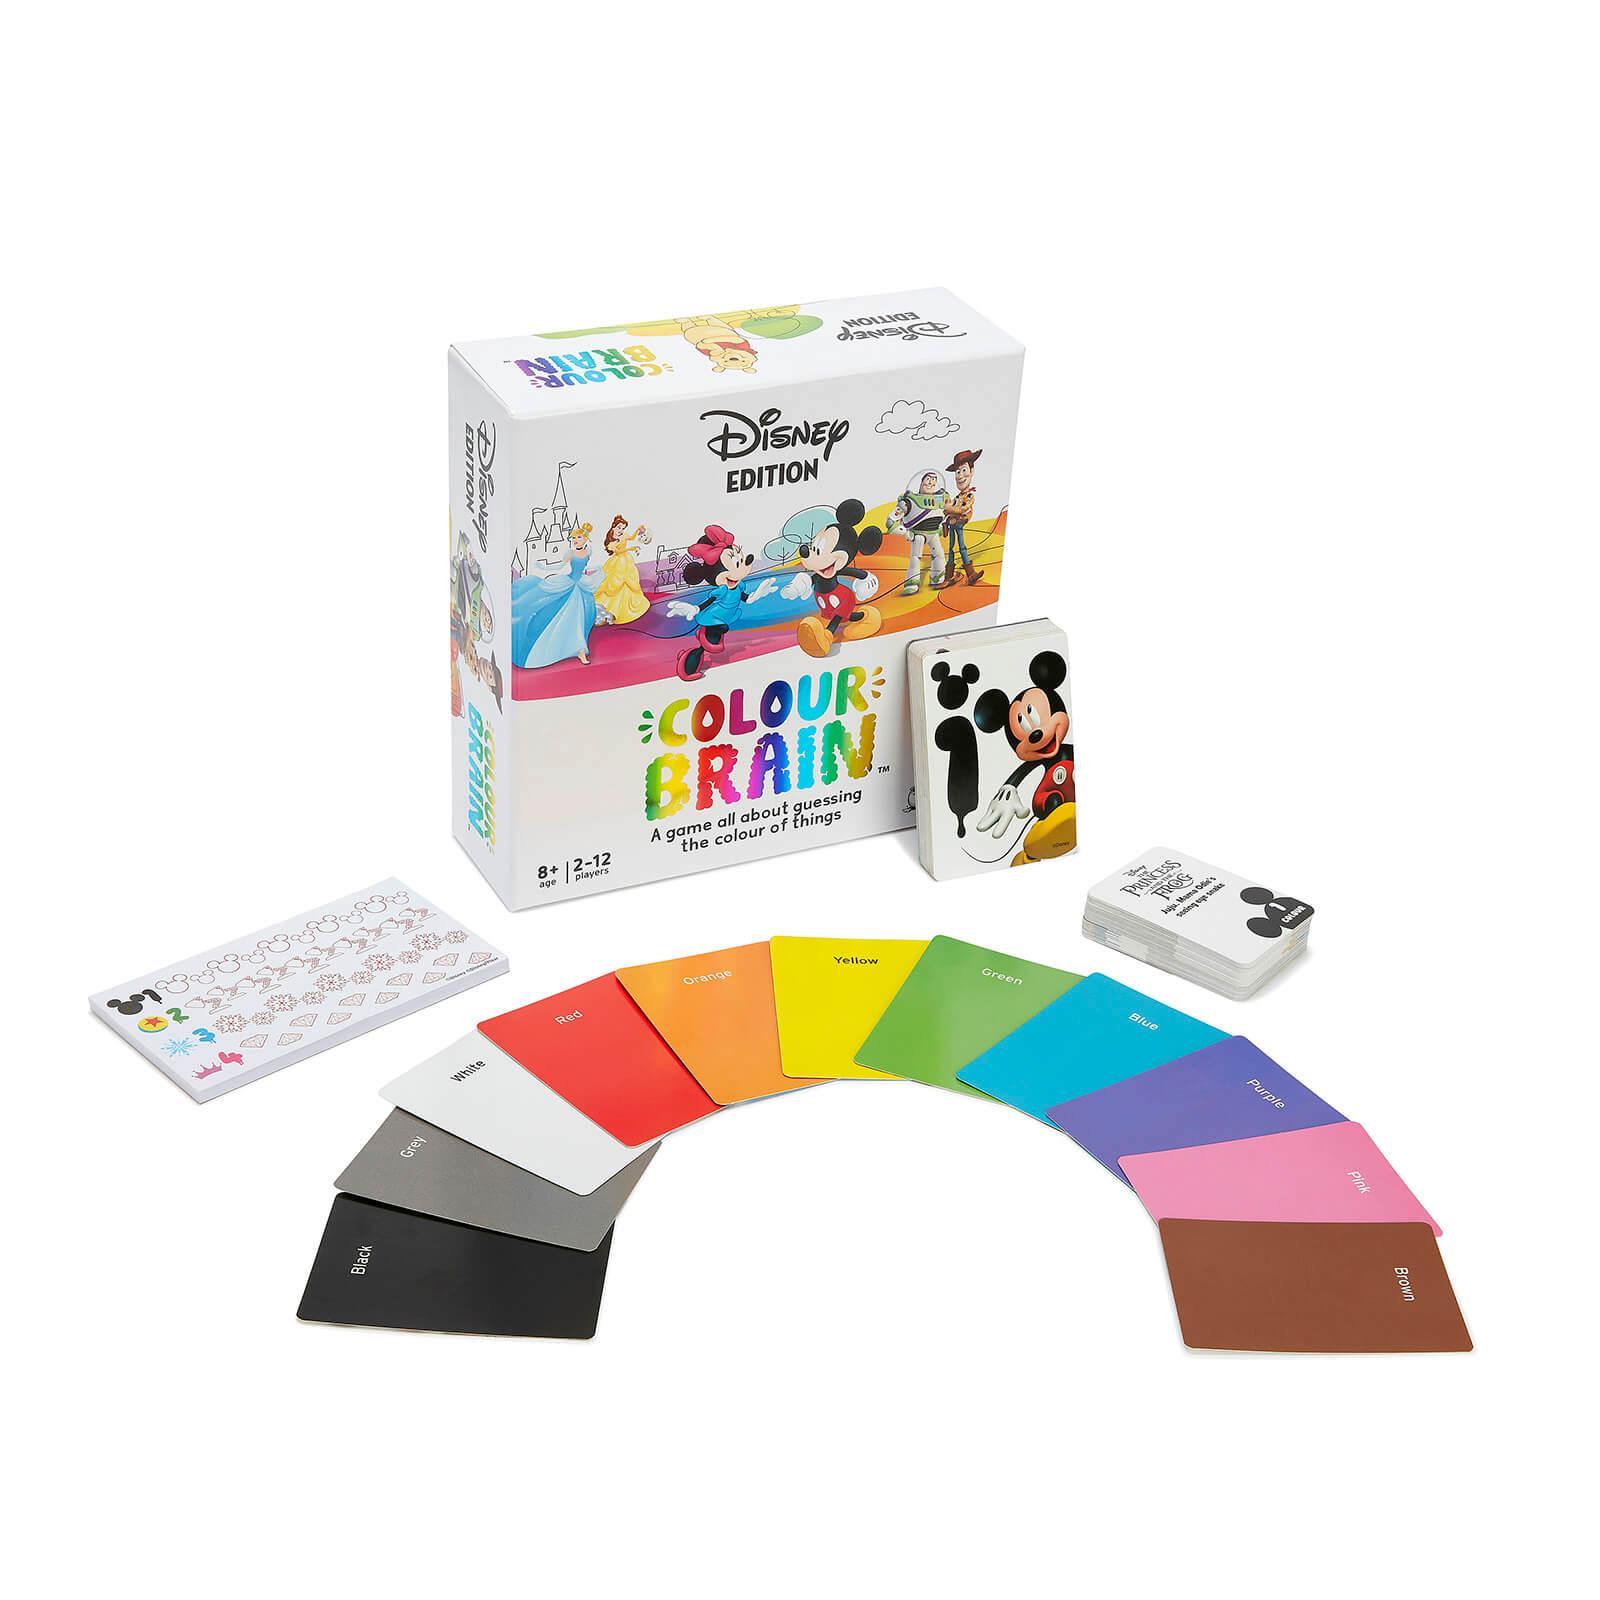 Image of Disney Colour Brain Game